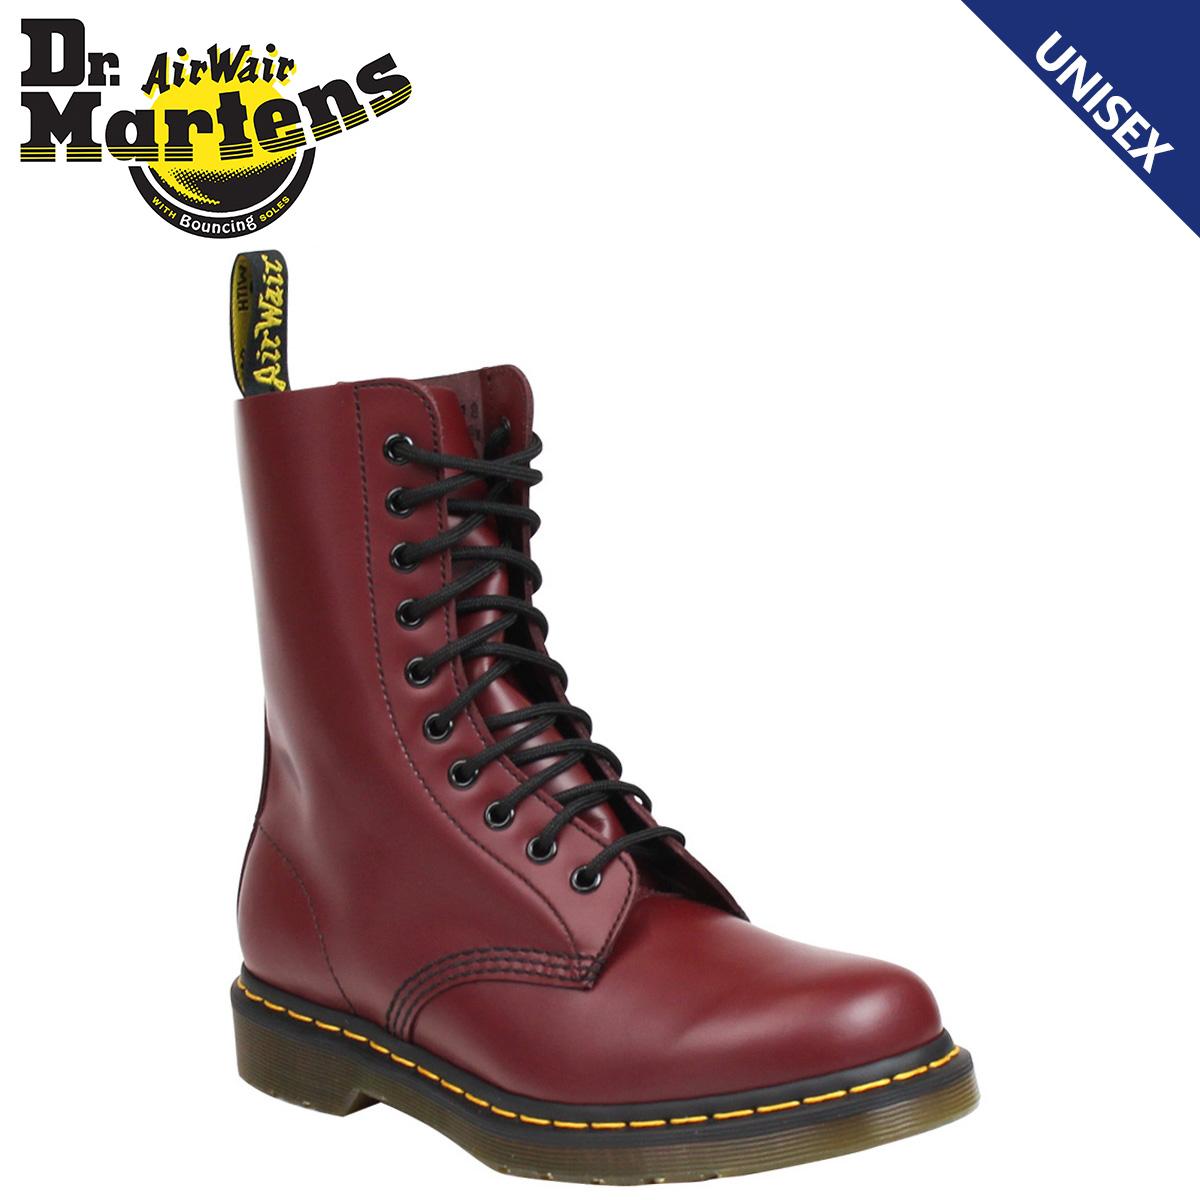 Dr.Martens ドクターマーチン 1490 10ホール ブーツ 10EYE BOOT R11857600 メンズ レディース